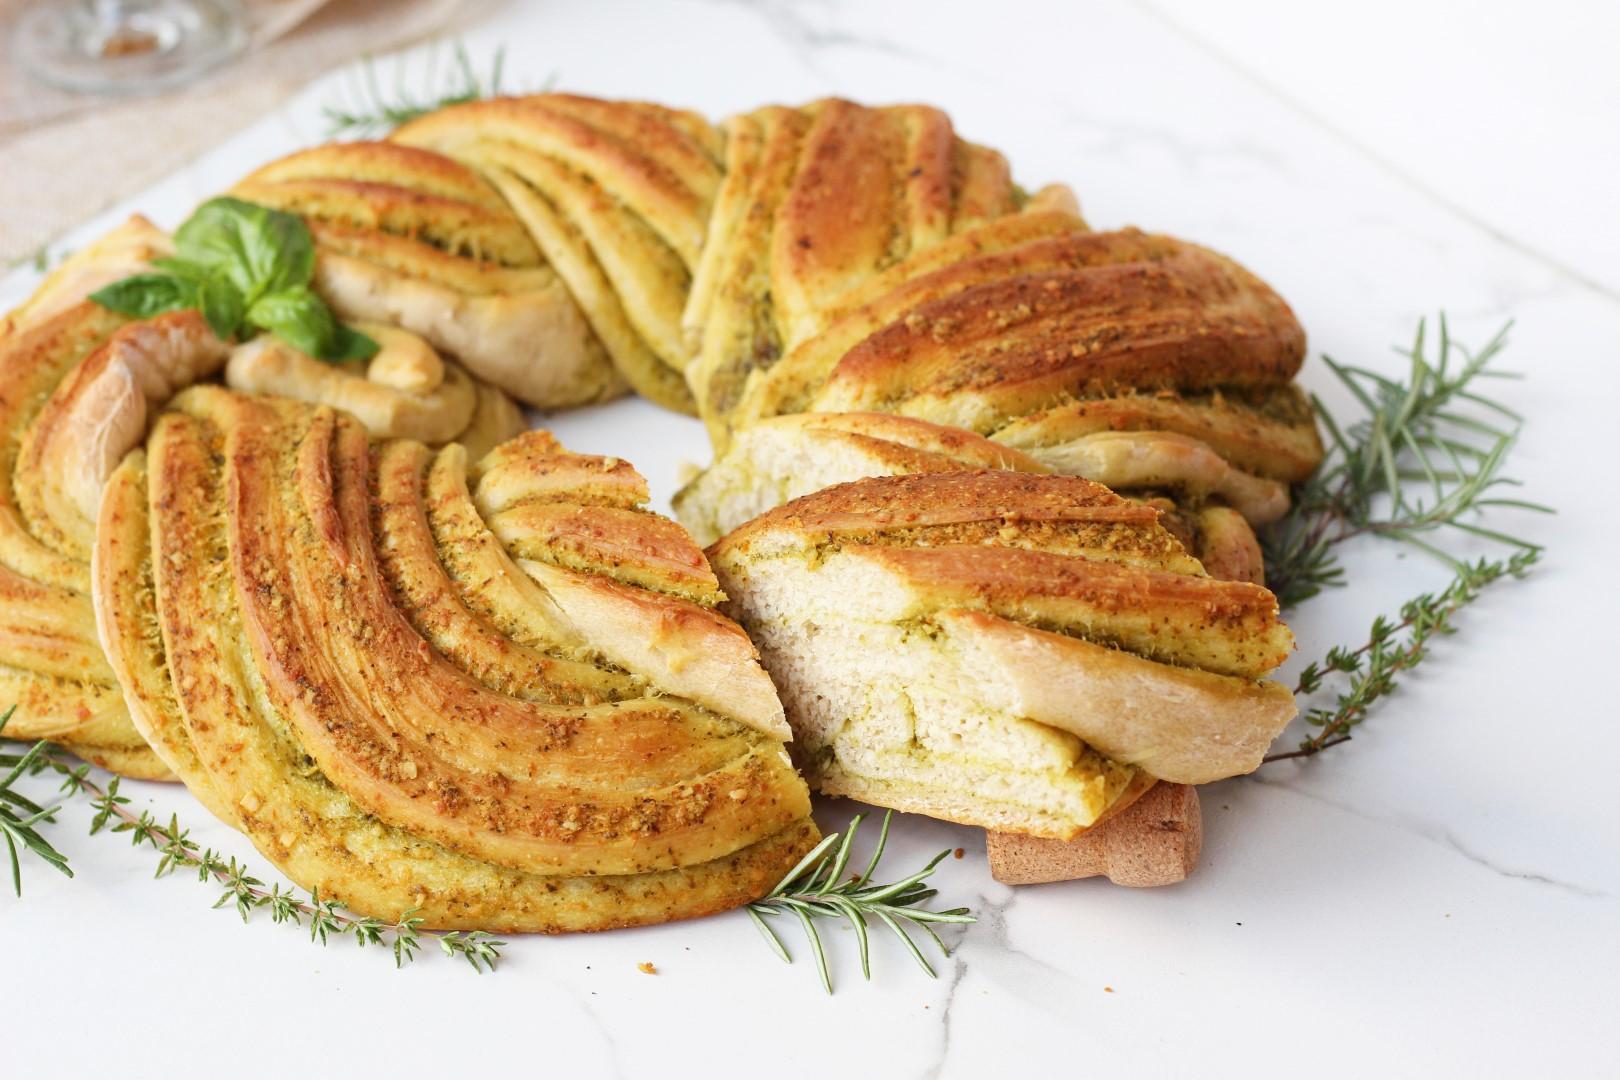 pan trenzado con pesto, corona de pan, como hacer pan, pan casero receta, recetas de cocina, recetas para navidad.